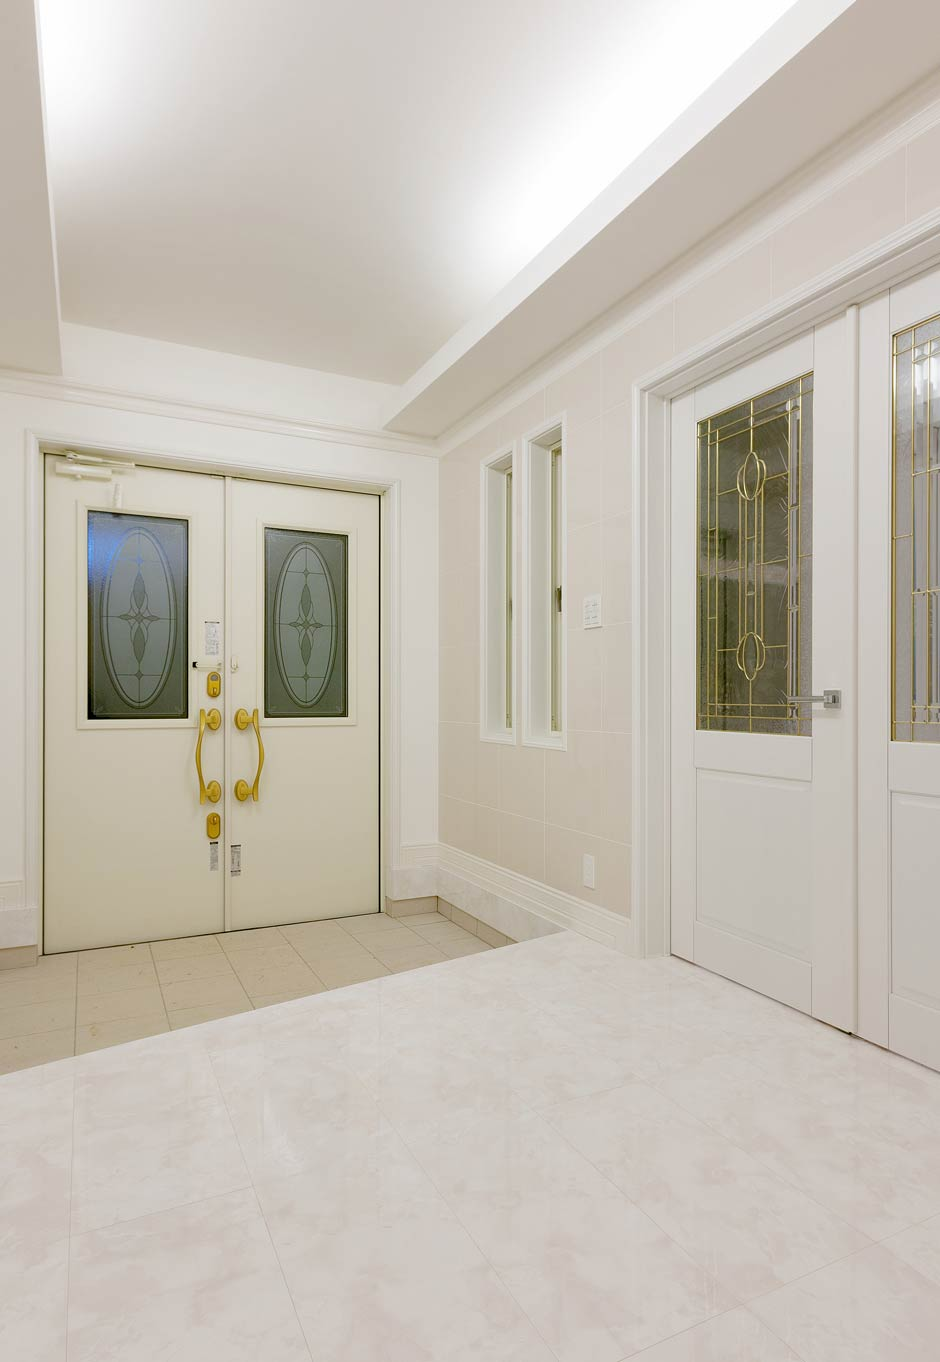 i.u.建築企画【デザイン住宅、建築家、インテリア】エントランス天井は間接照明に。壁は大理石調のタイルを使用。扉はステンドガラスの大きな親子扉に